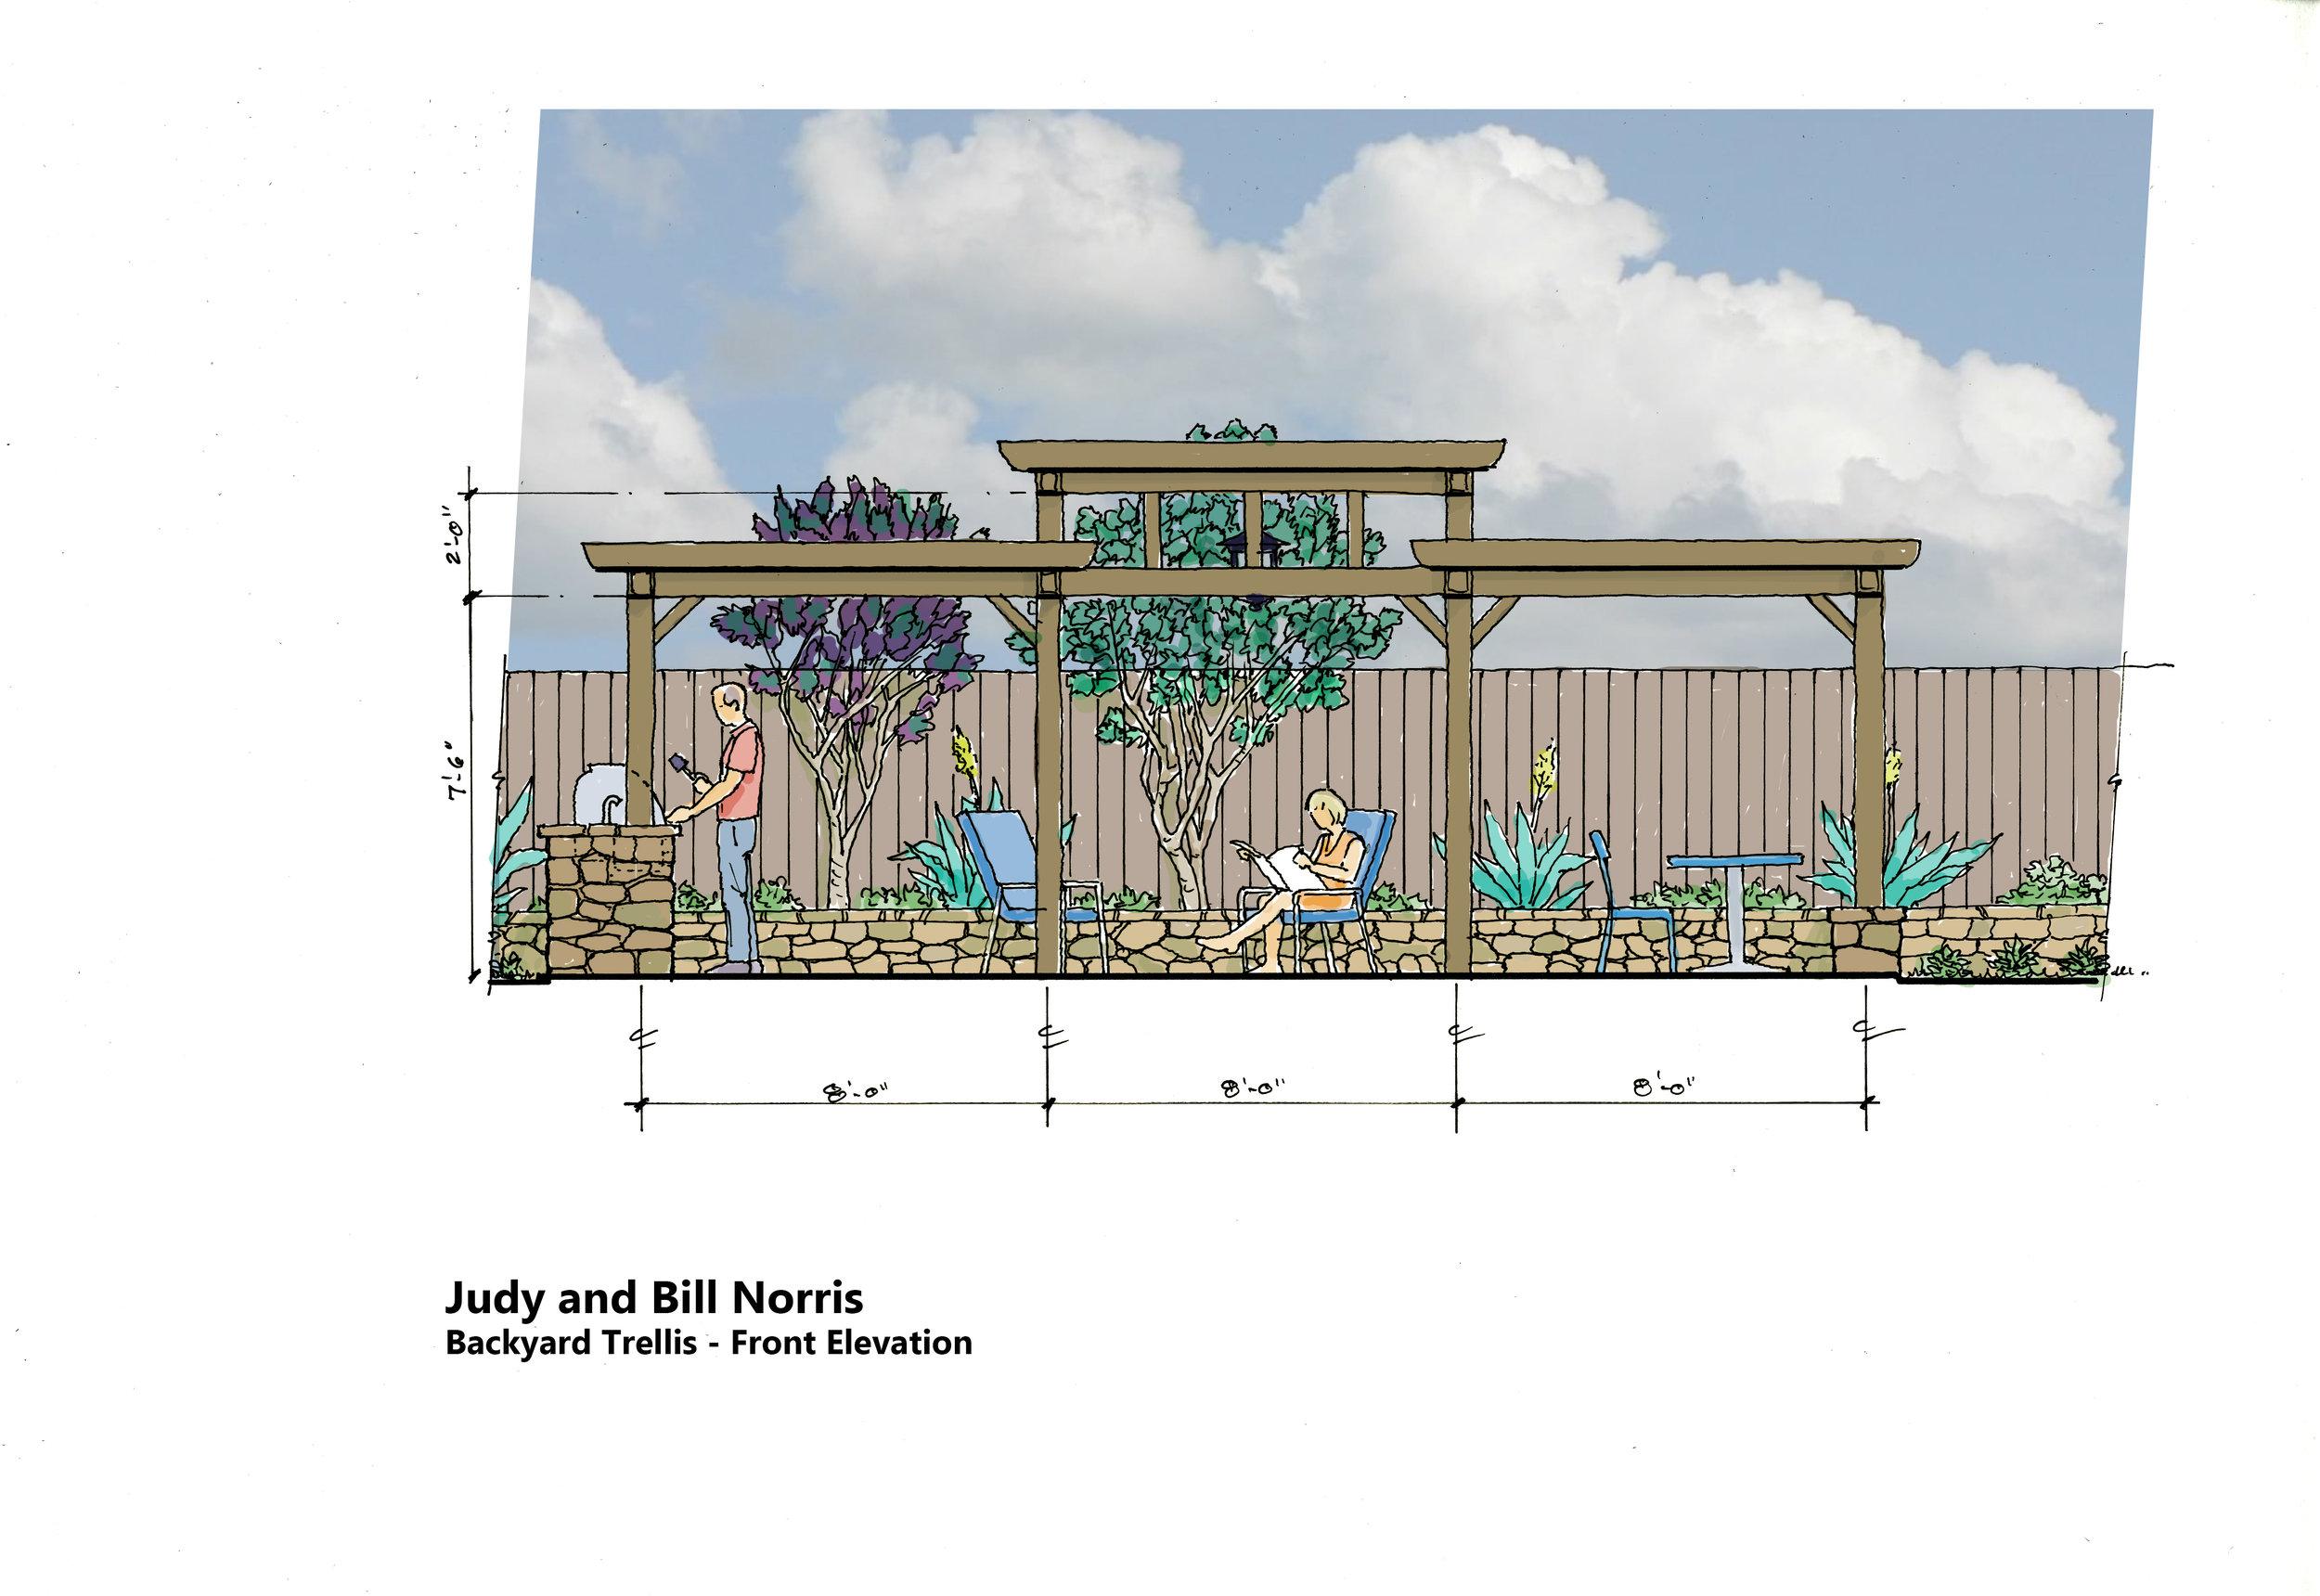 Norris backyard and trellis